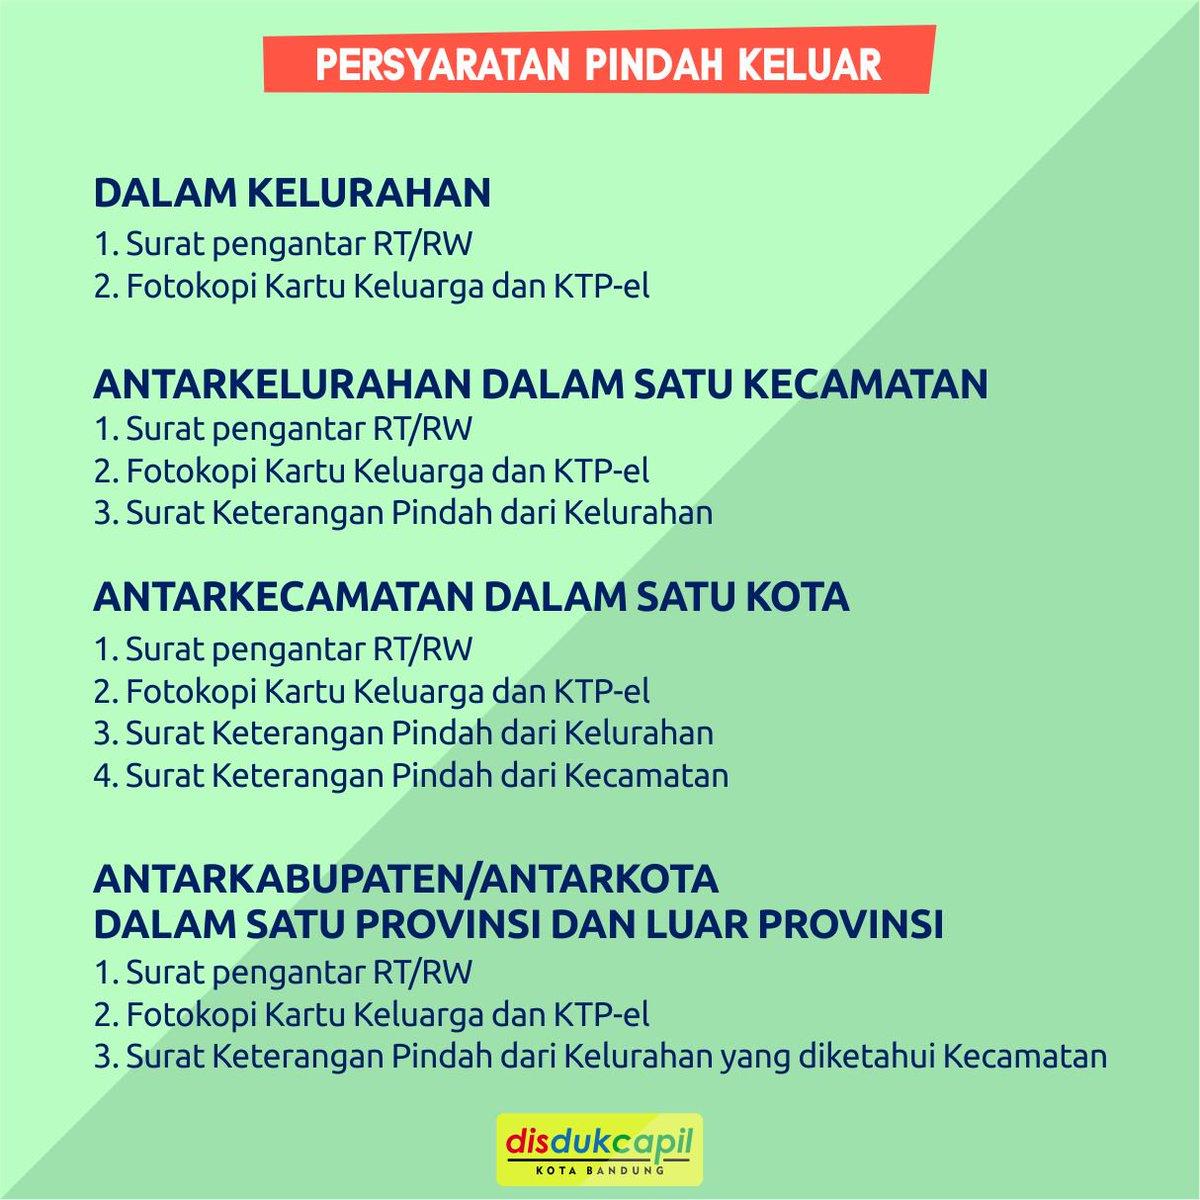 Disdukcapil Kota Bandung On Twitter Tentang Surat Pindah